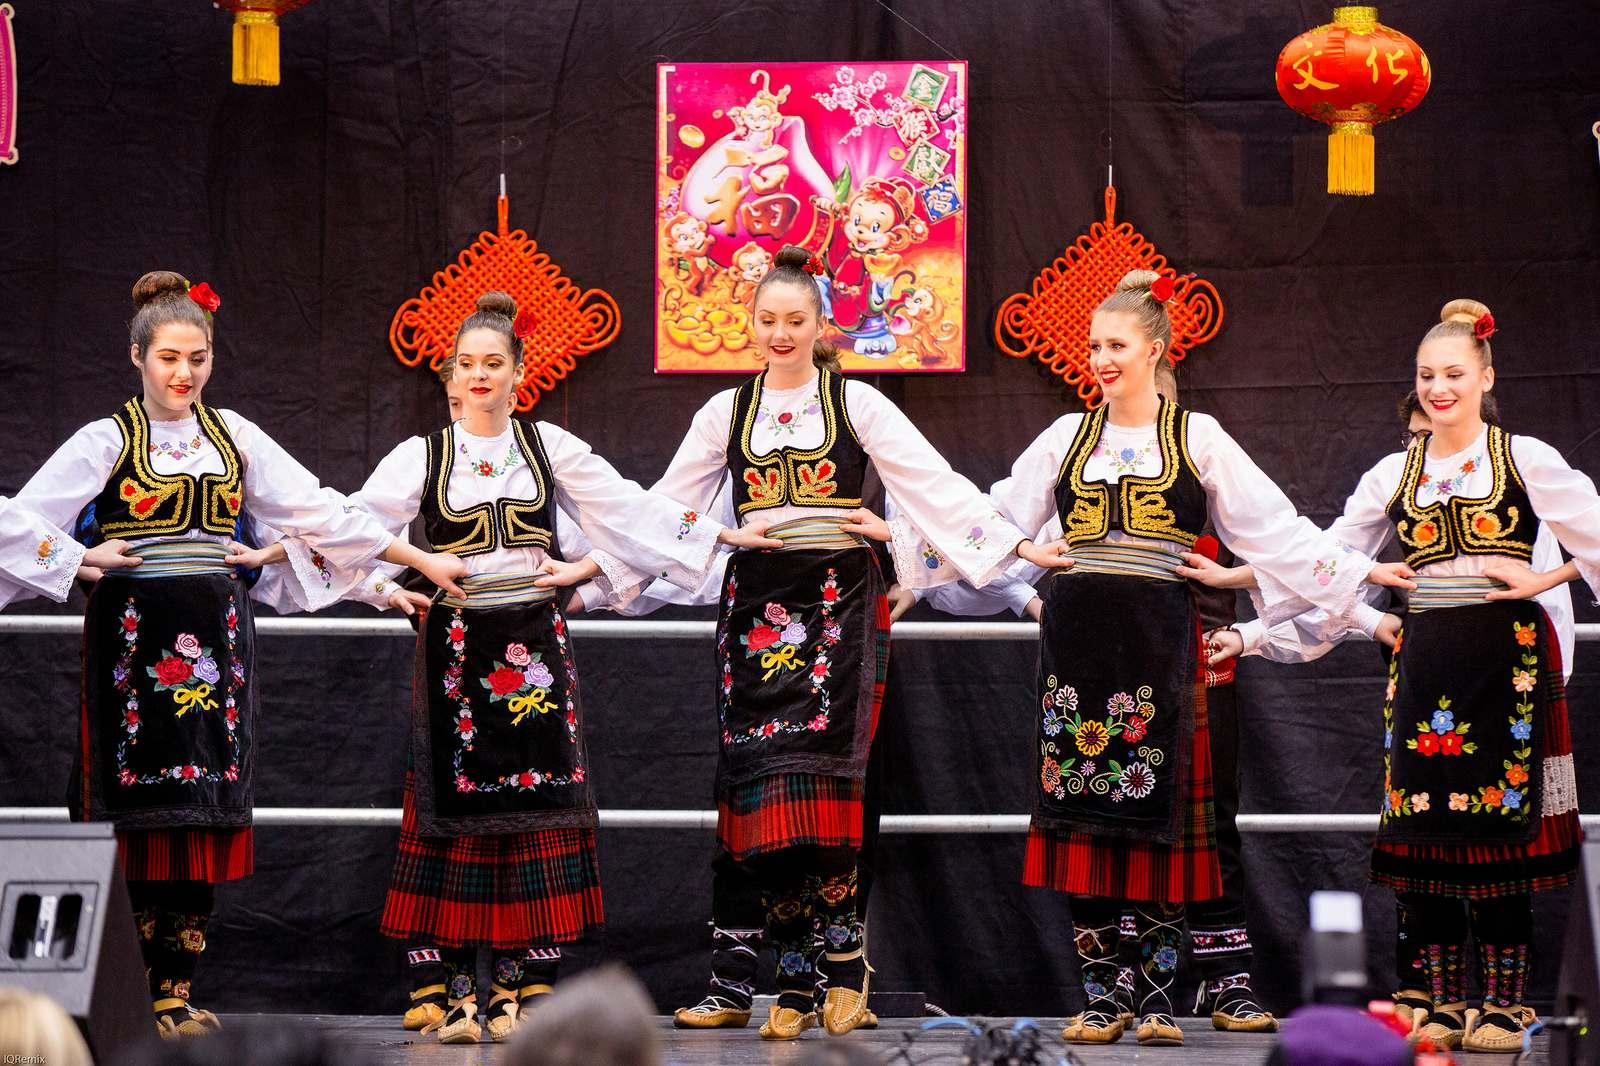 lunar new year9 Lunar Chinese New Year 2016 in Edmonton